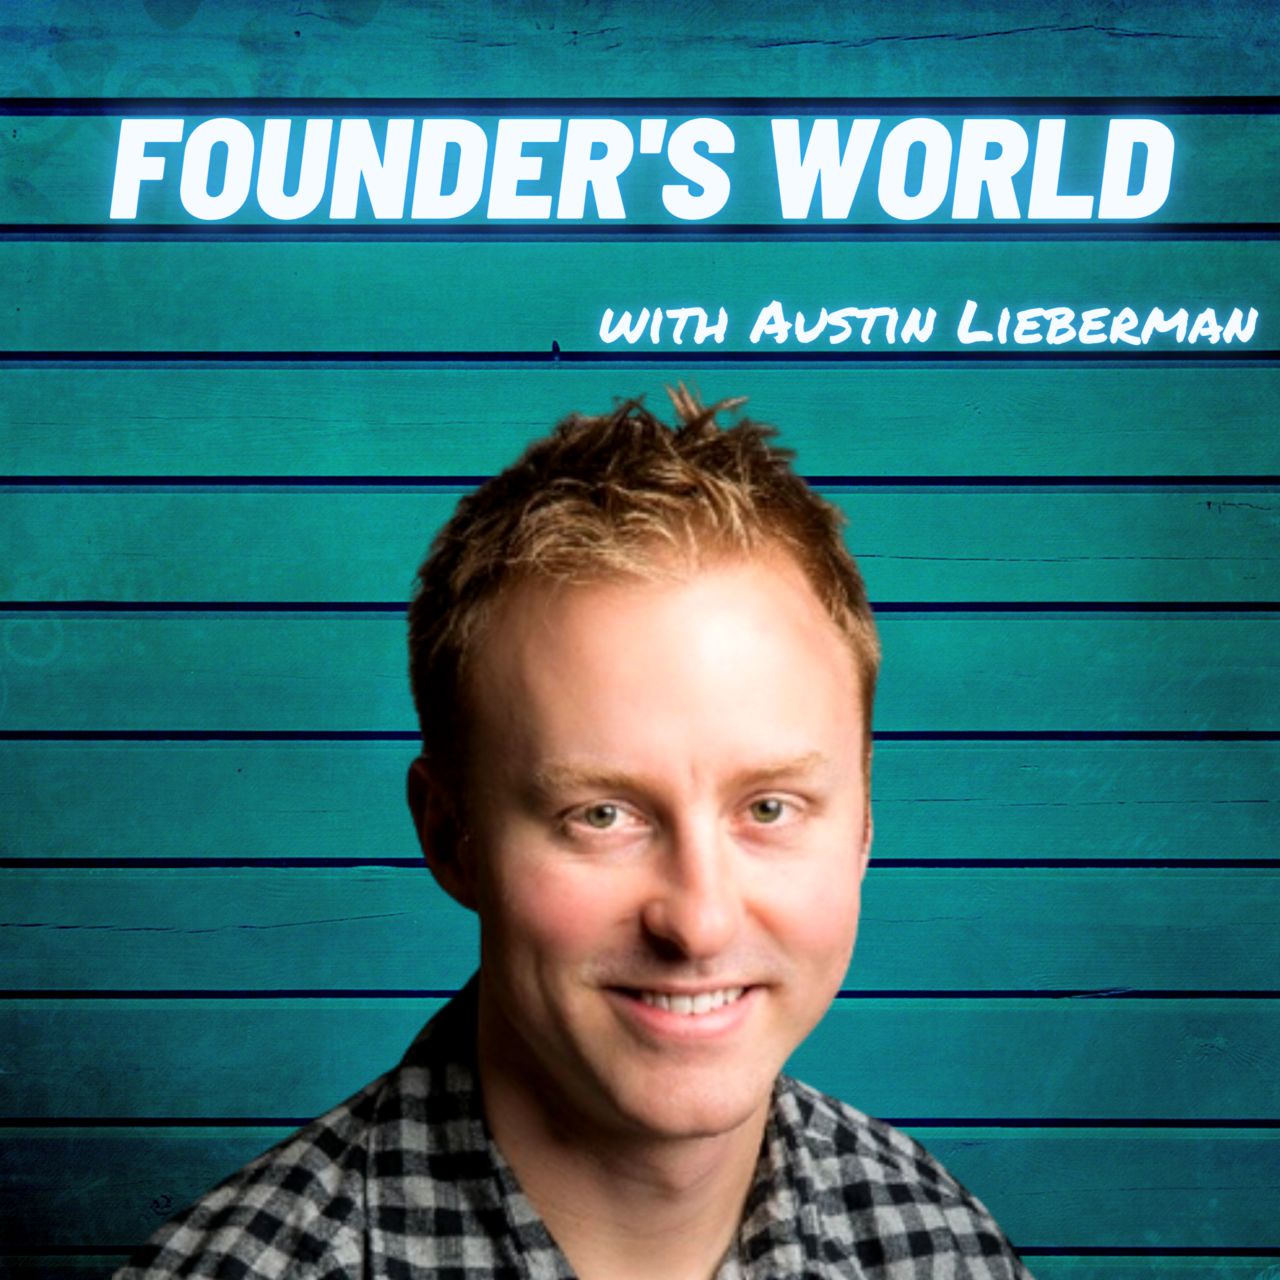 Founder's World